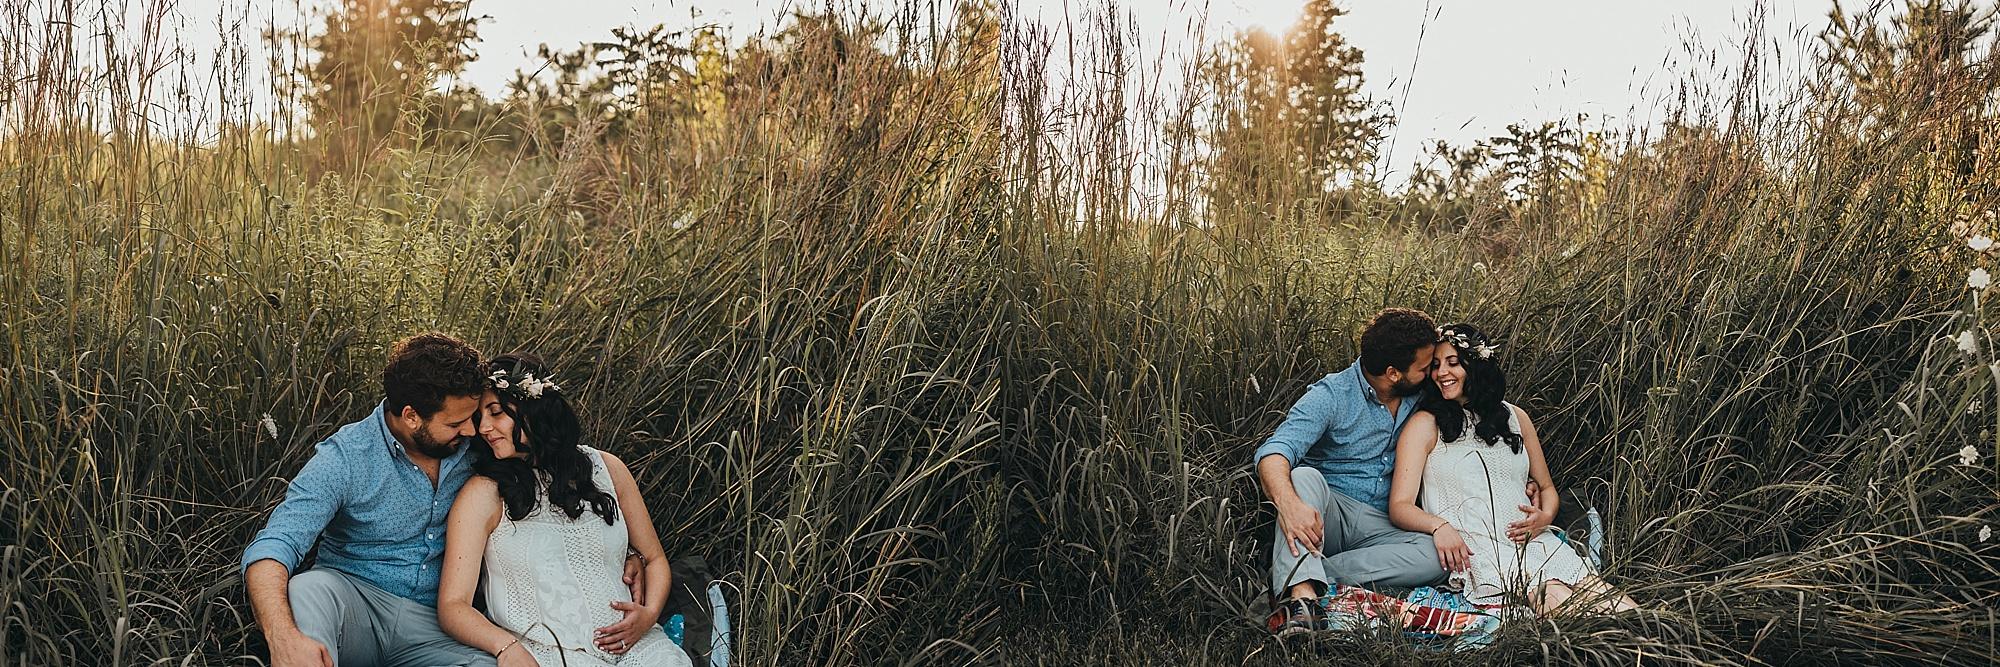 lauren-grayson-photography-cleveland-ohio-photographer-maternity-summer-outdoor-bohemian-fields-session_0471.jpg